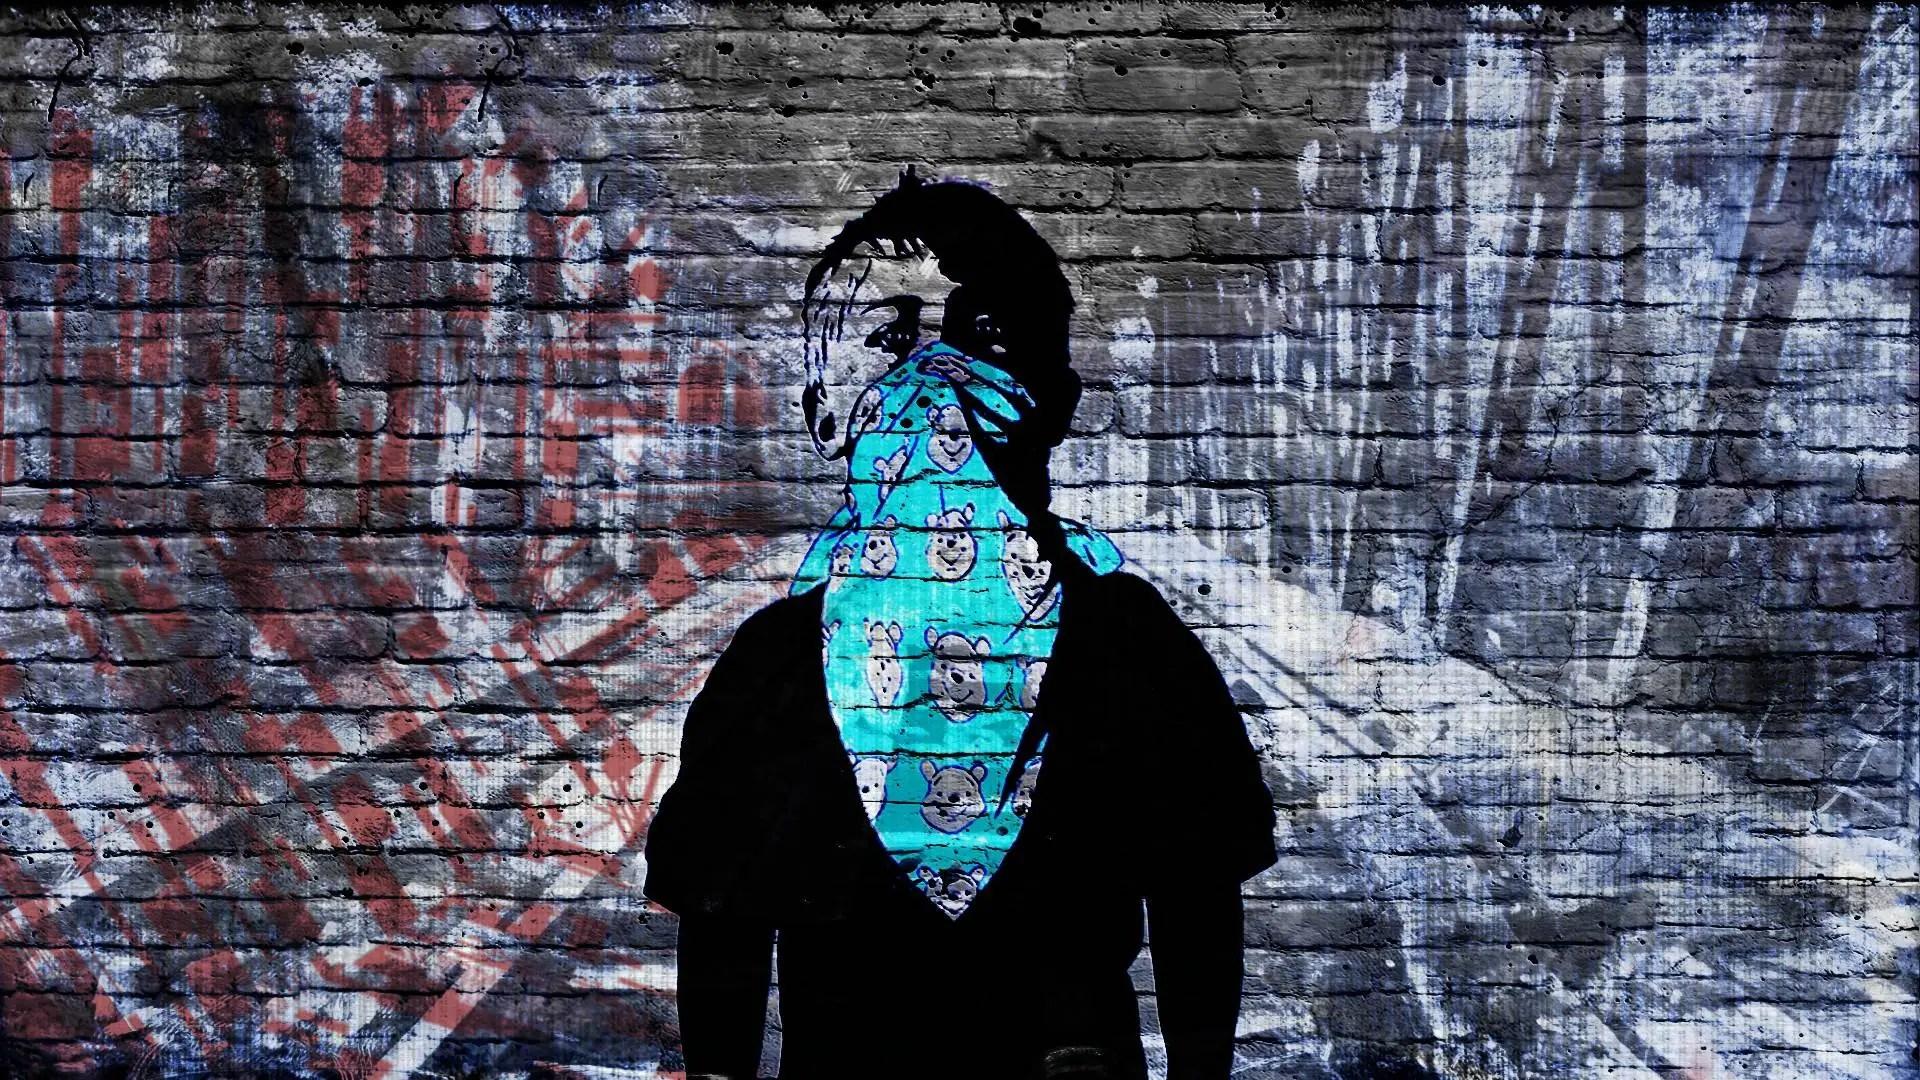 Cool Trippy Wallpaper boy wall